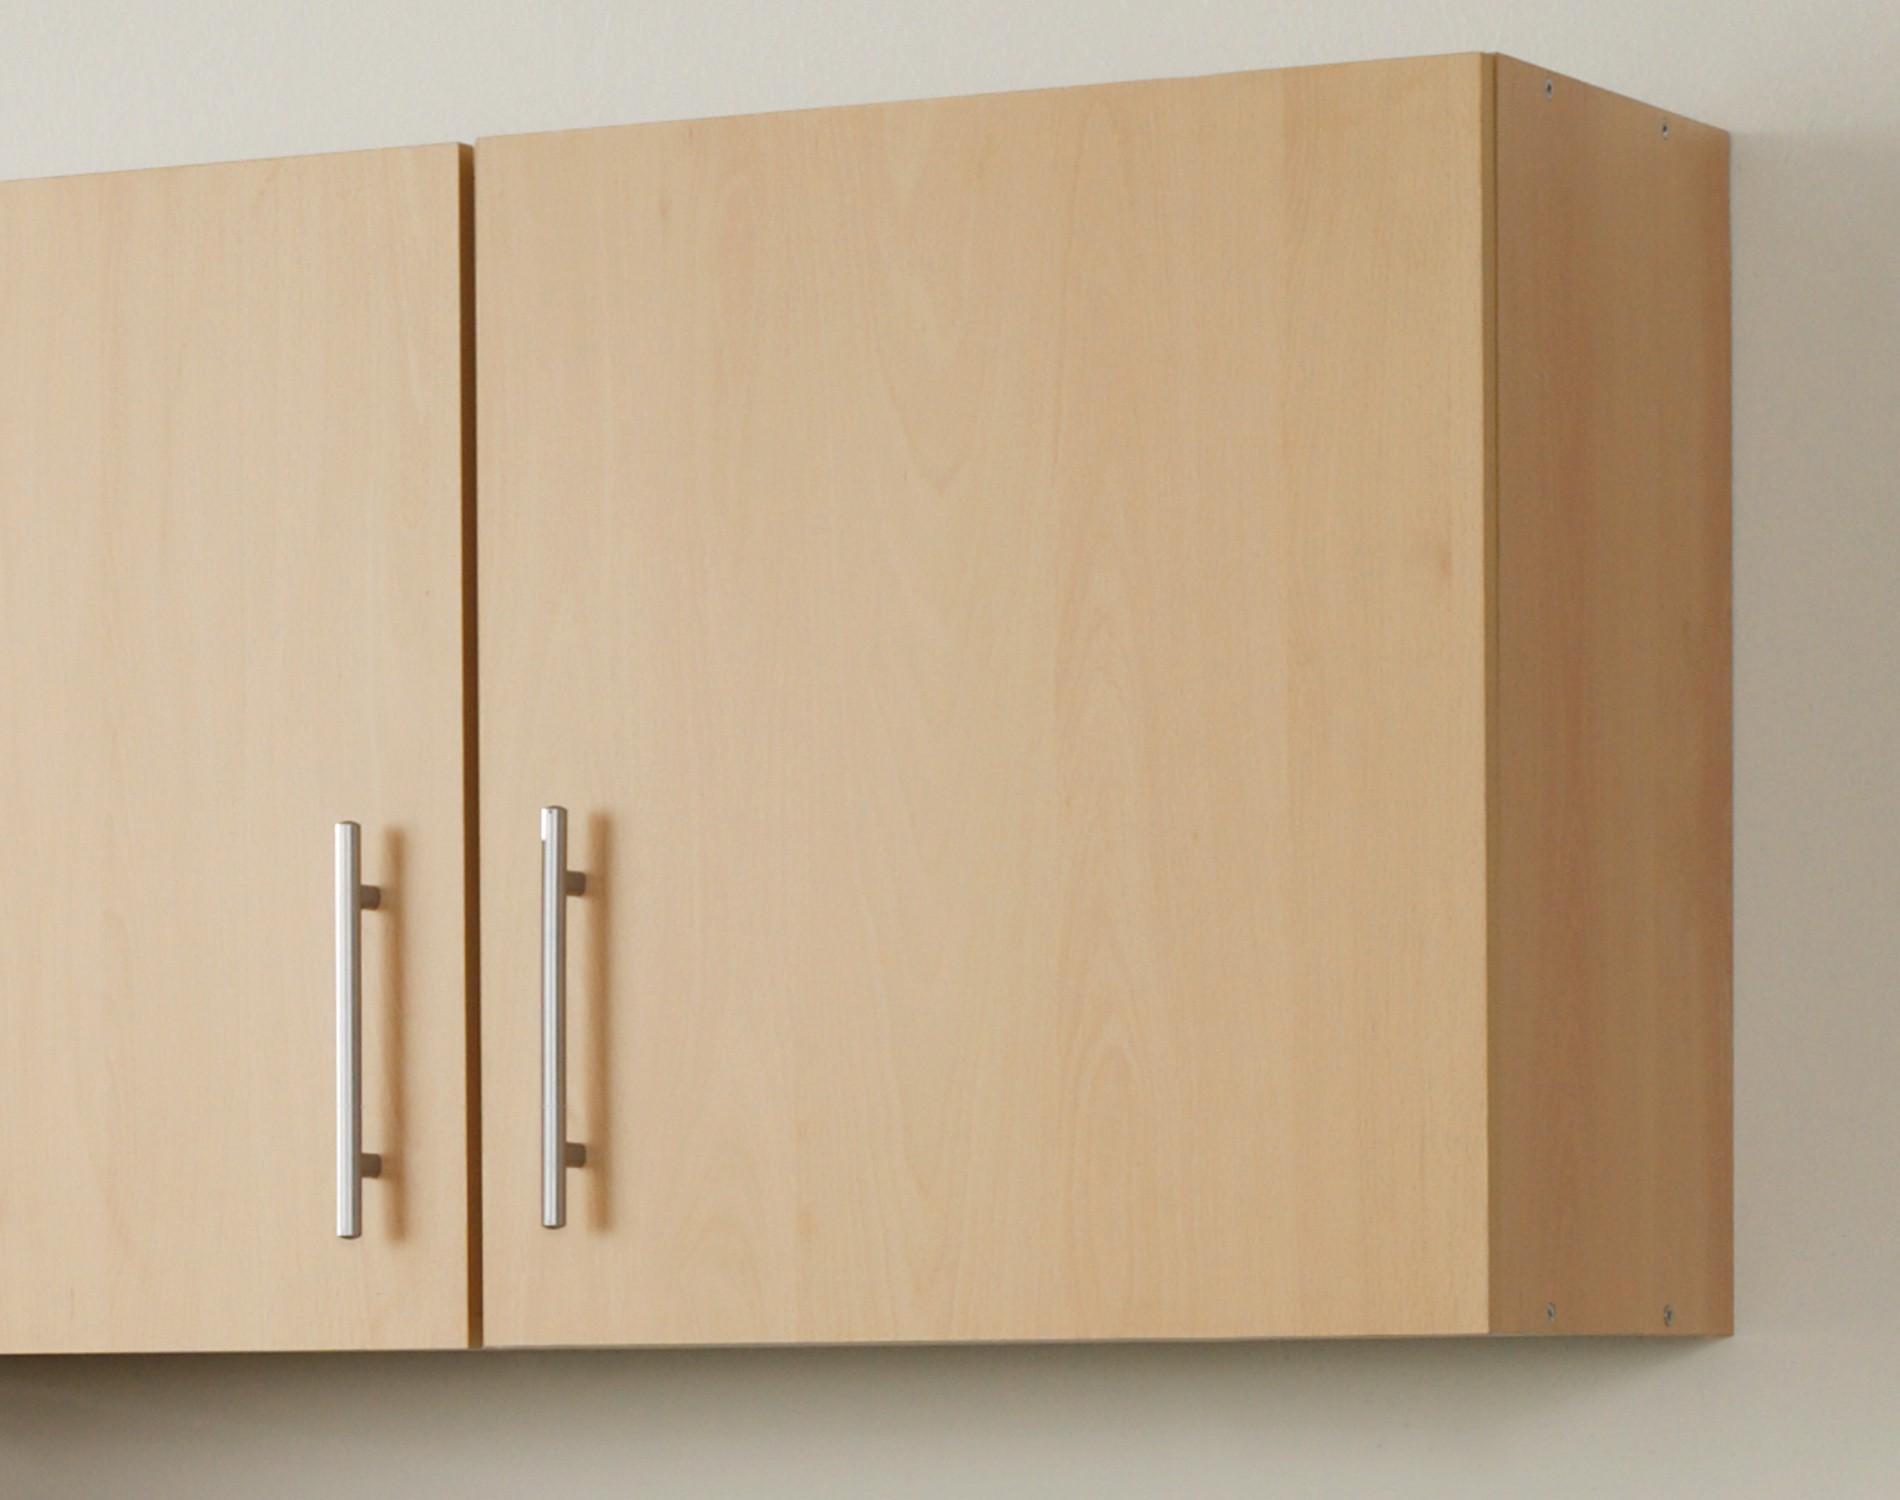 Smeg Kühlschrank Hellgrau : Kühlschrank cm breit smeg gas elektro standherd cpf gwhd